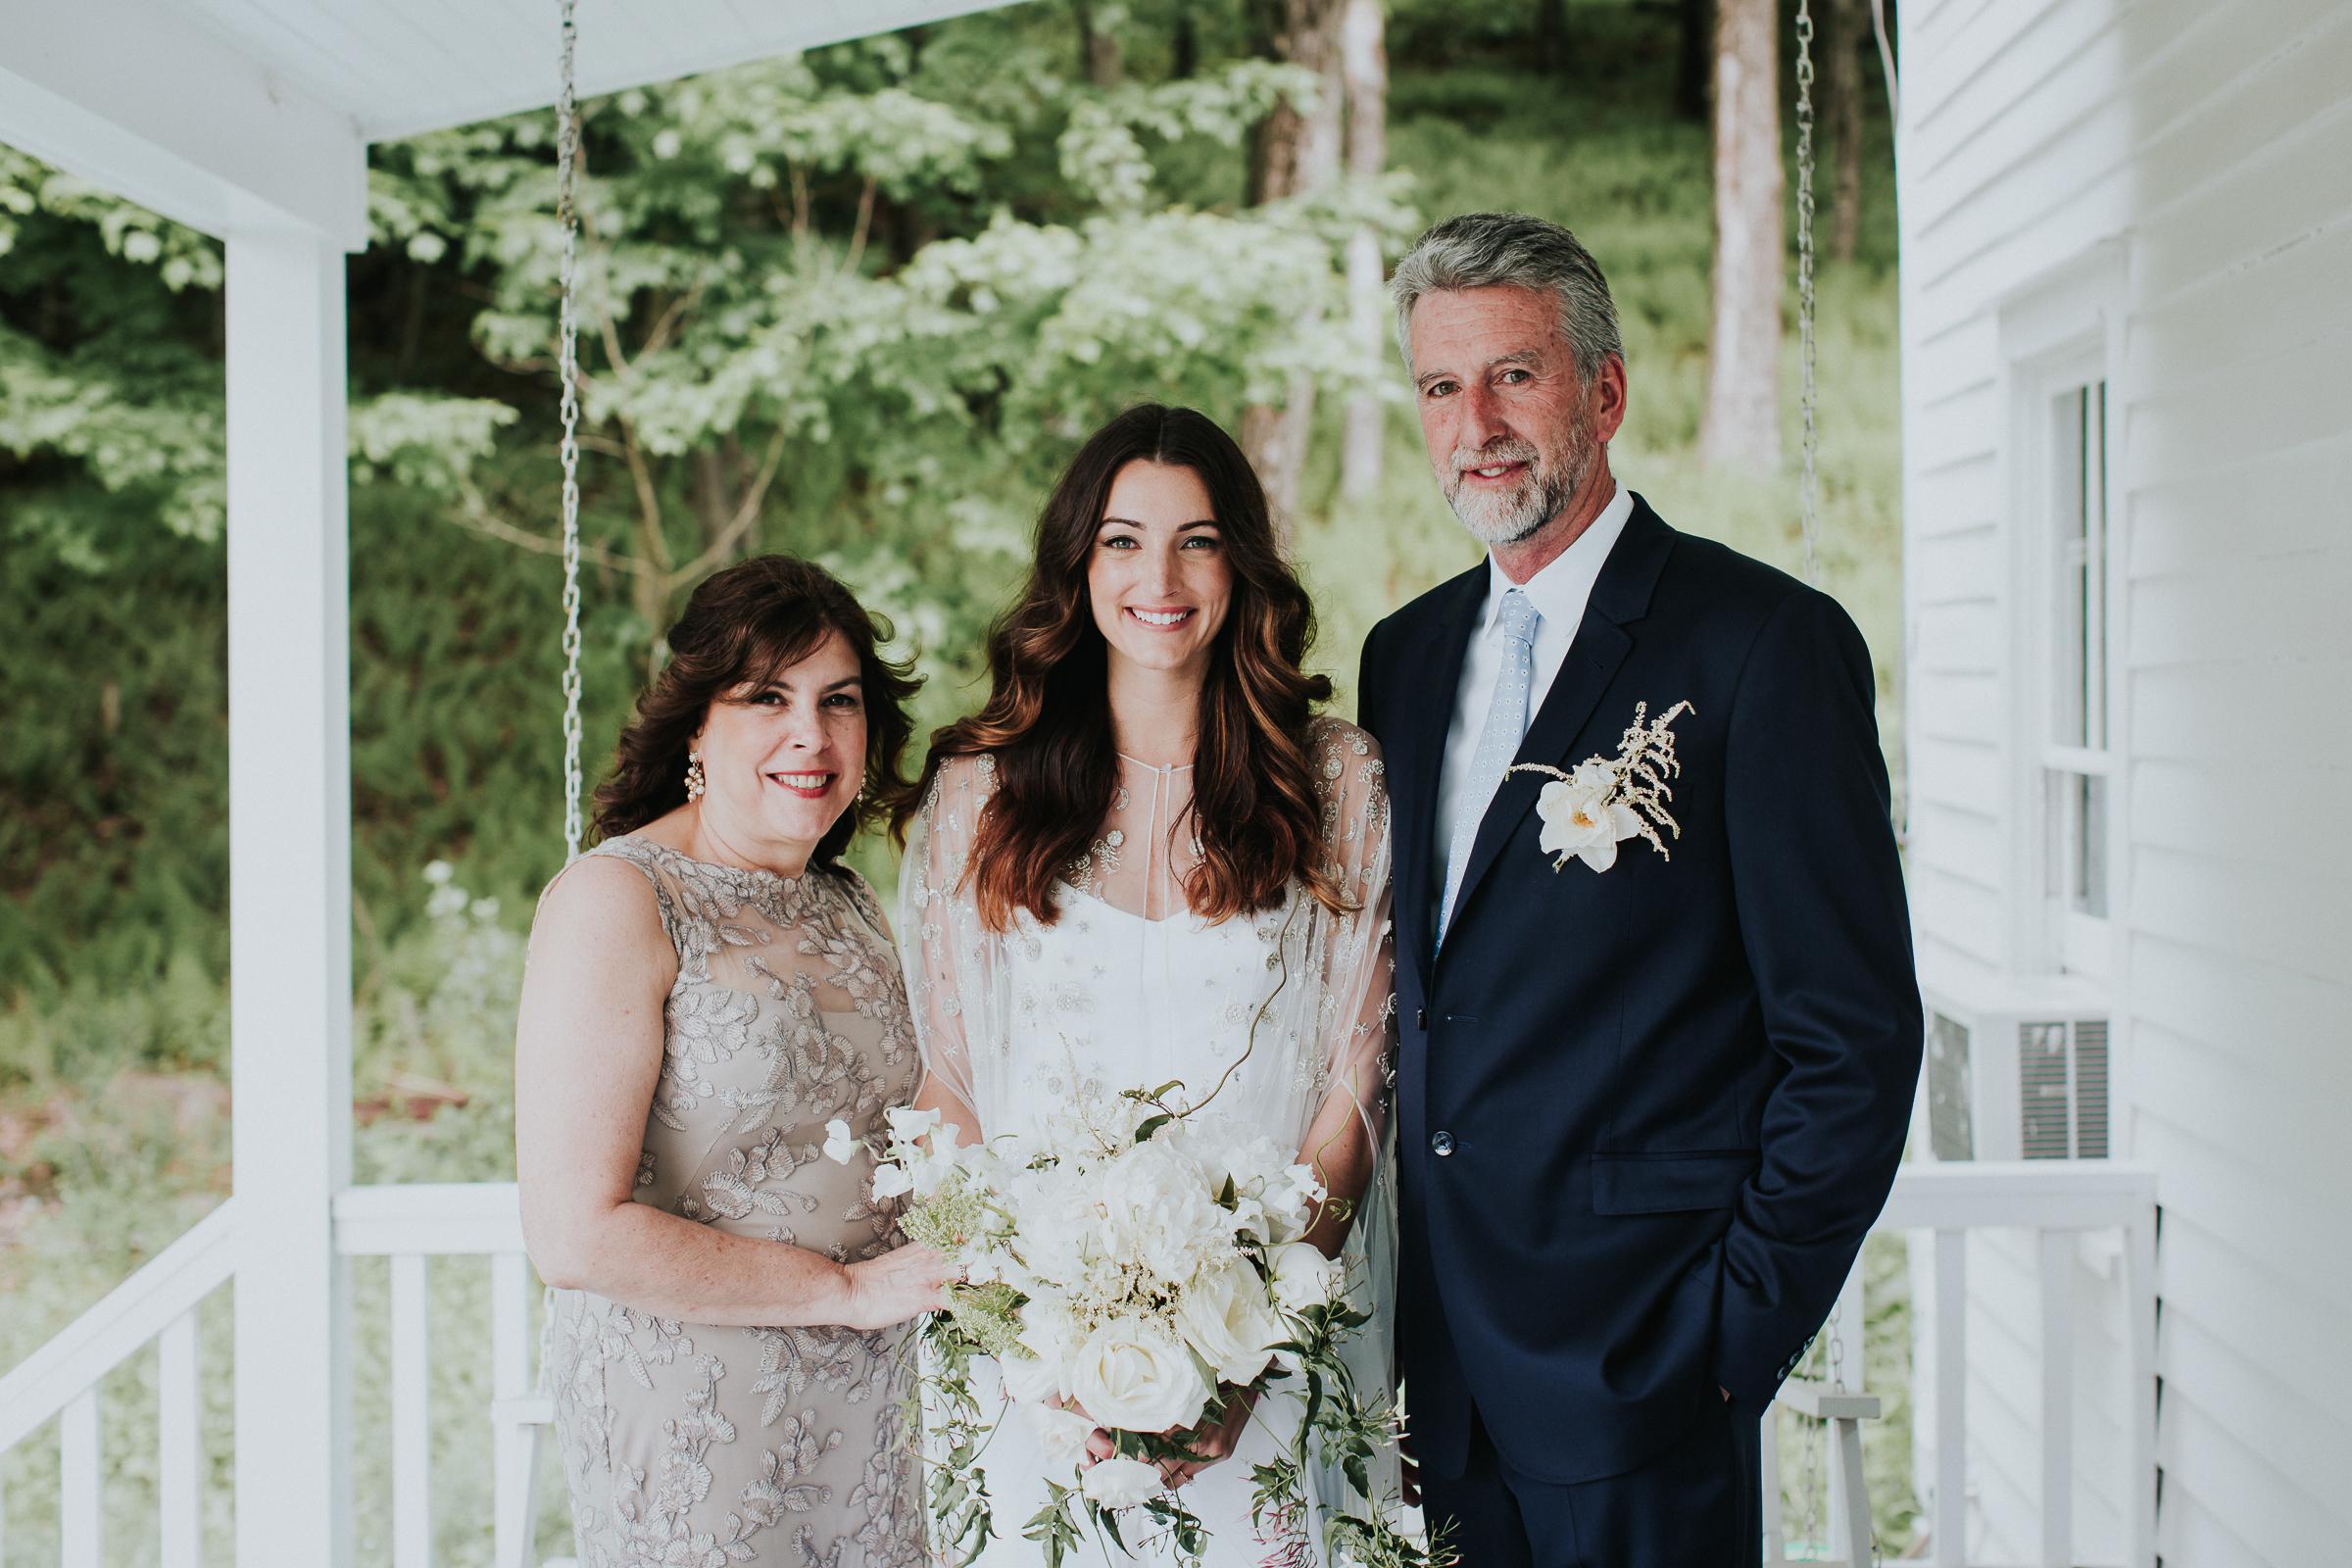 Handsome-Hollow-Long-Eddy-Catskills-New-York-Fine-Art-Documentary-Wedding-Photographer-50.jpg